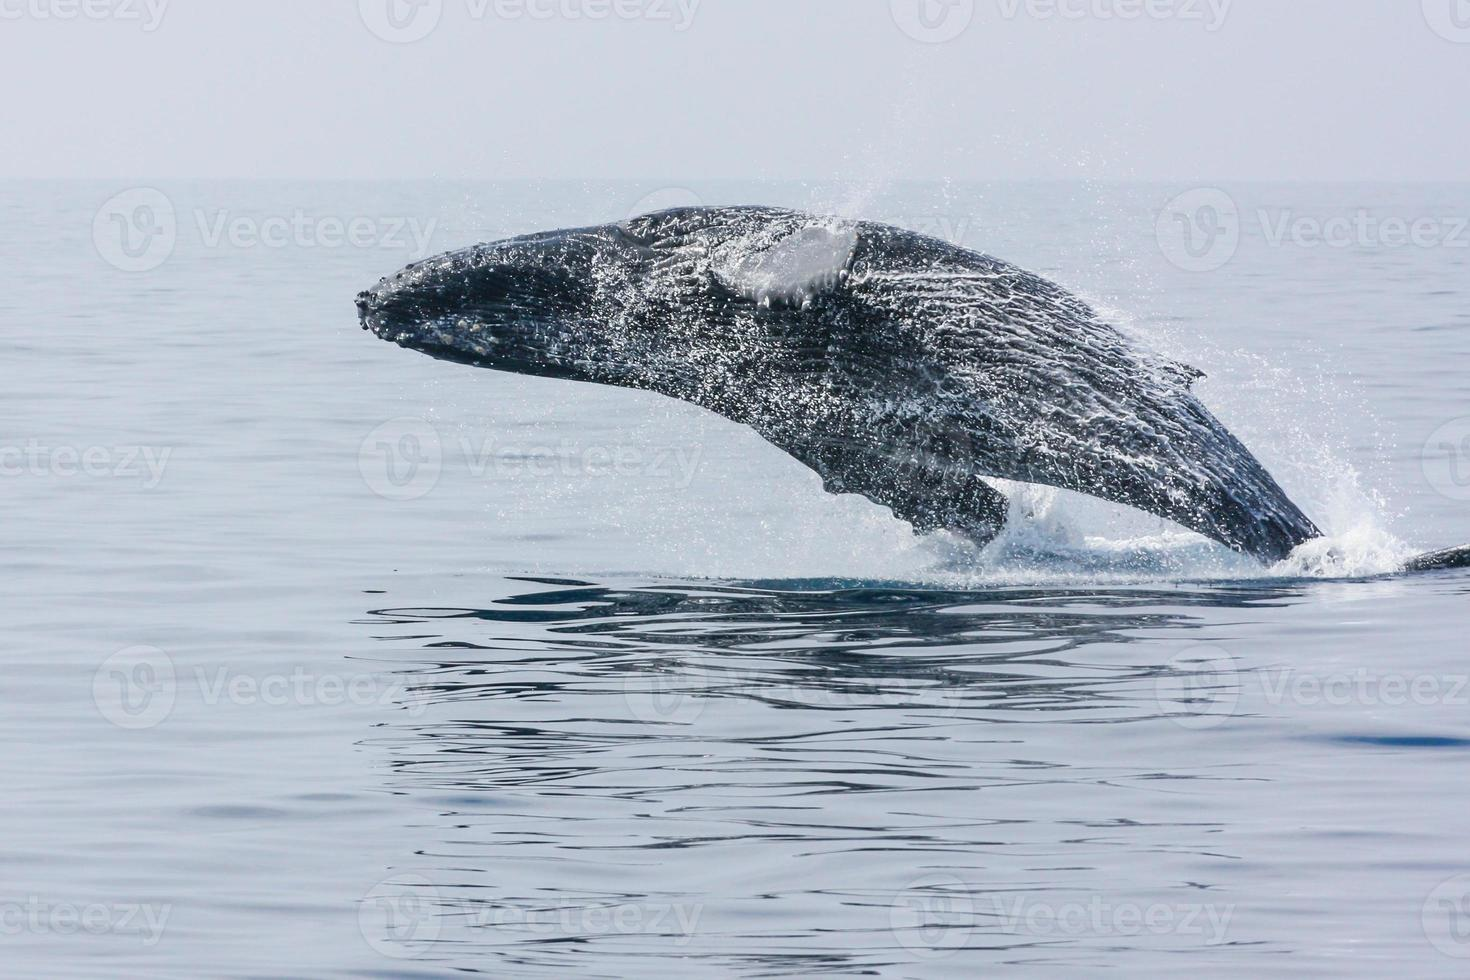 violando la ballena jorobada foto